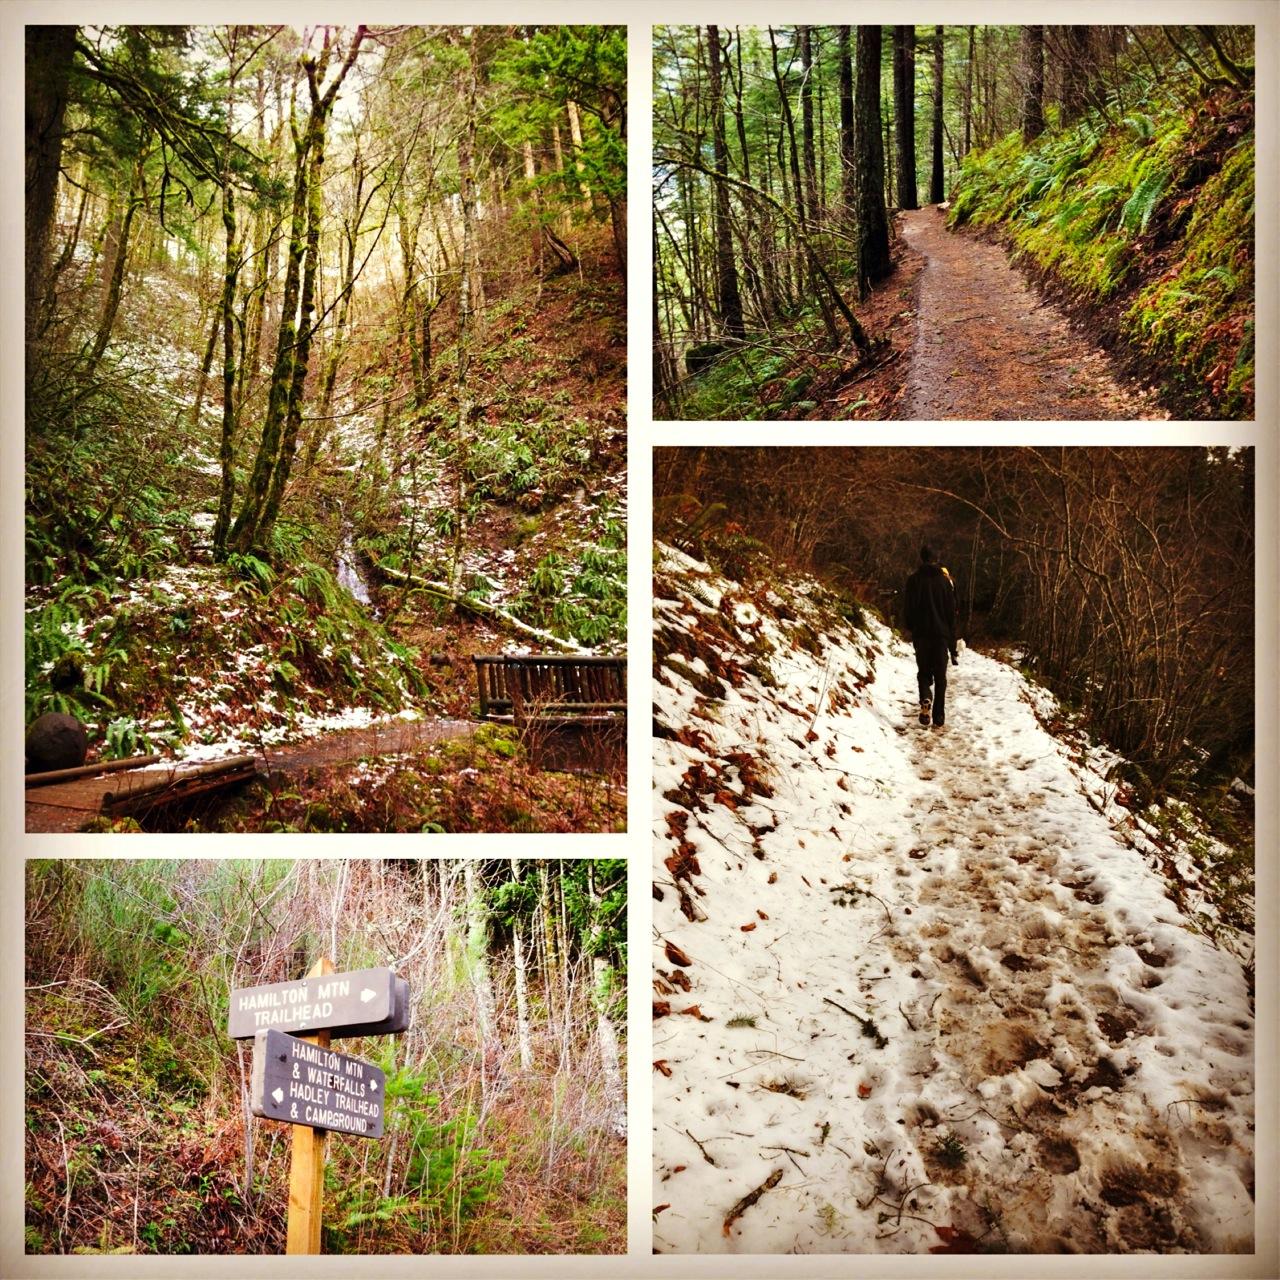 Hamilton Trail